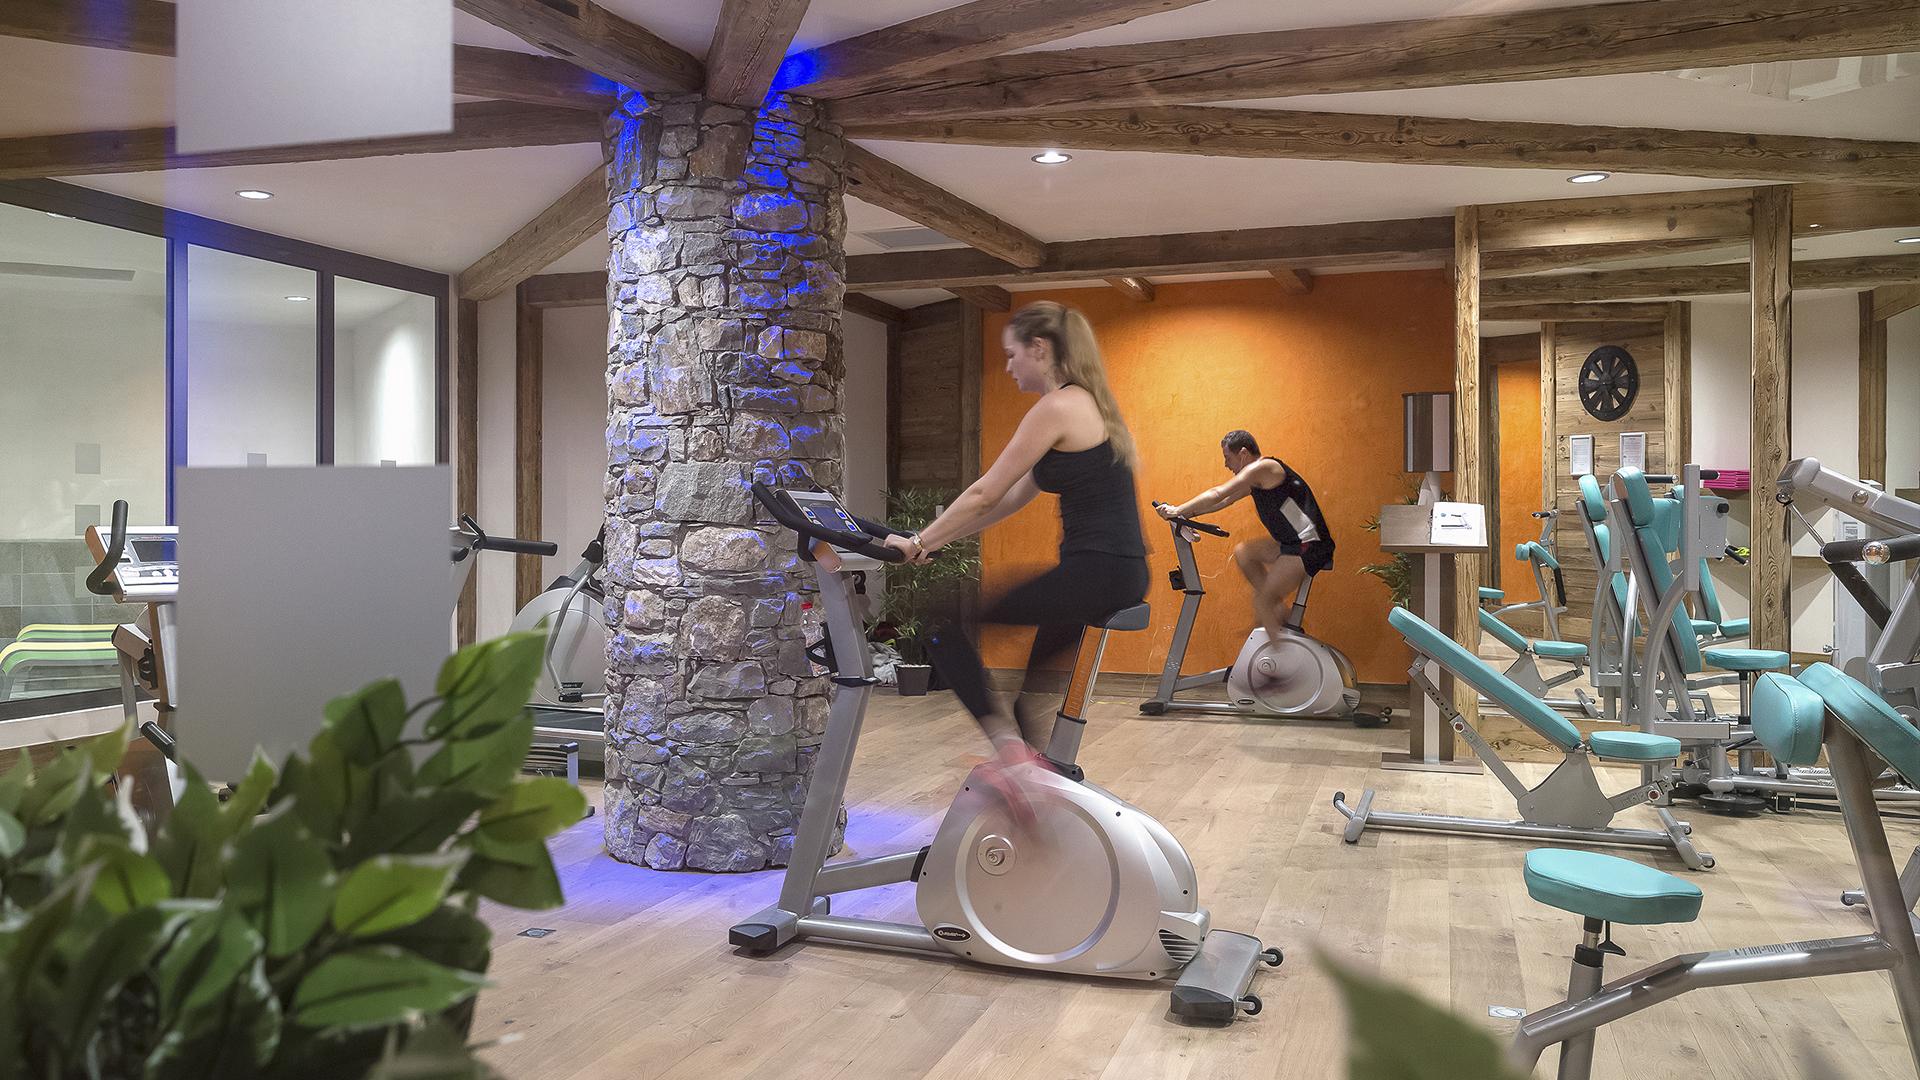 Salle de Cardio-training, Le Kalinda - CGH Résidences